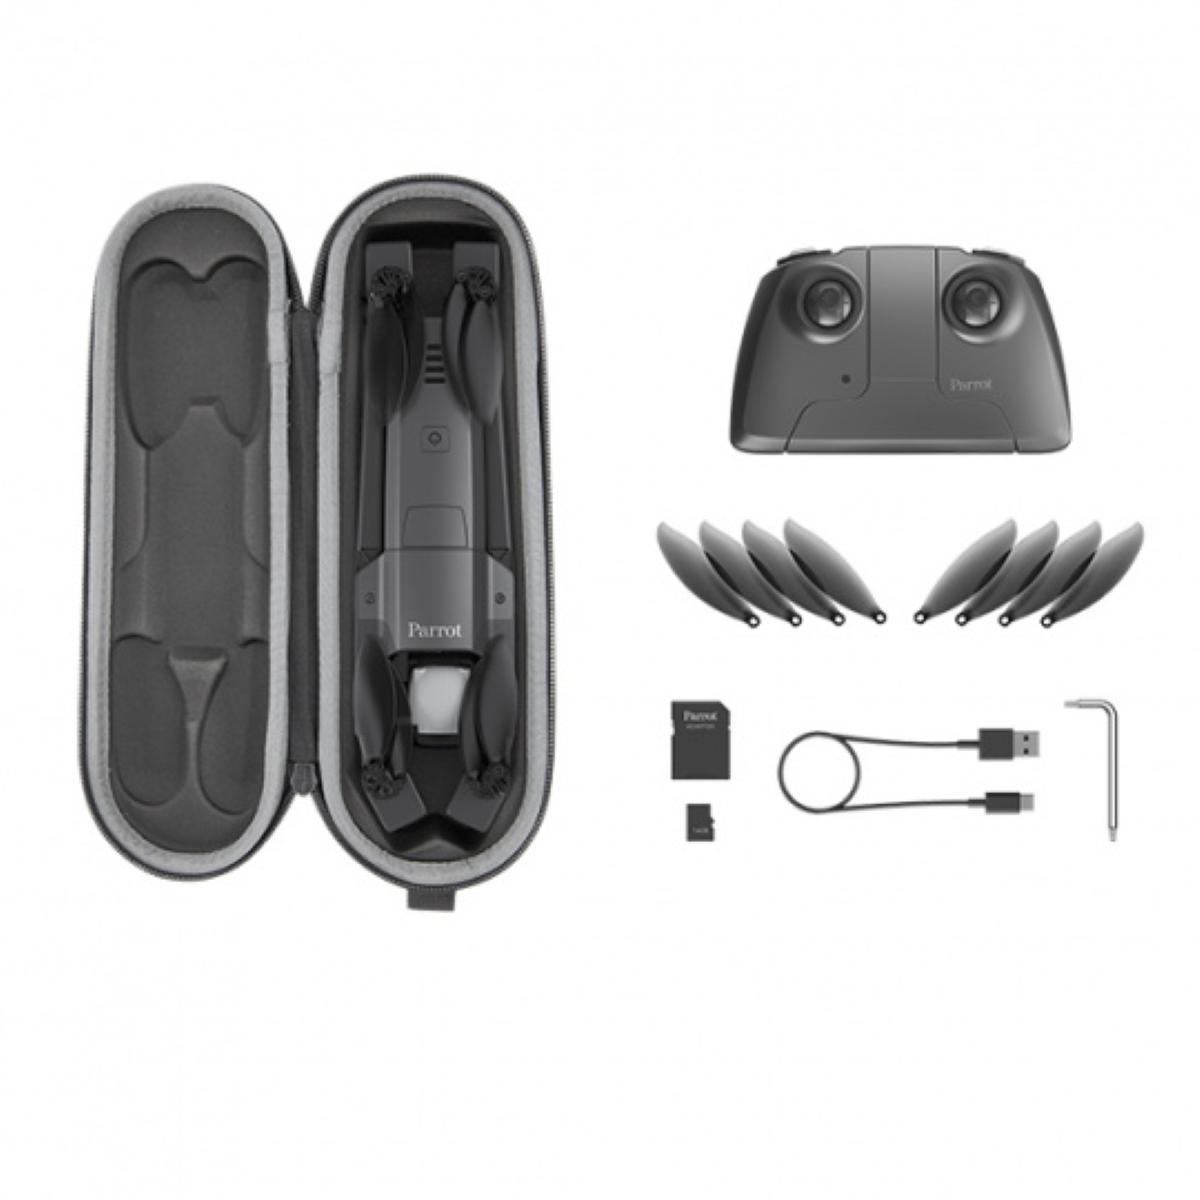 Parrot Anafi 4K HDR Camera Drone - Box Contents